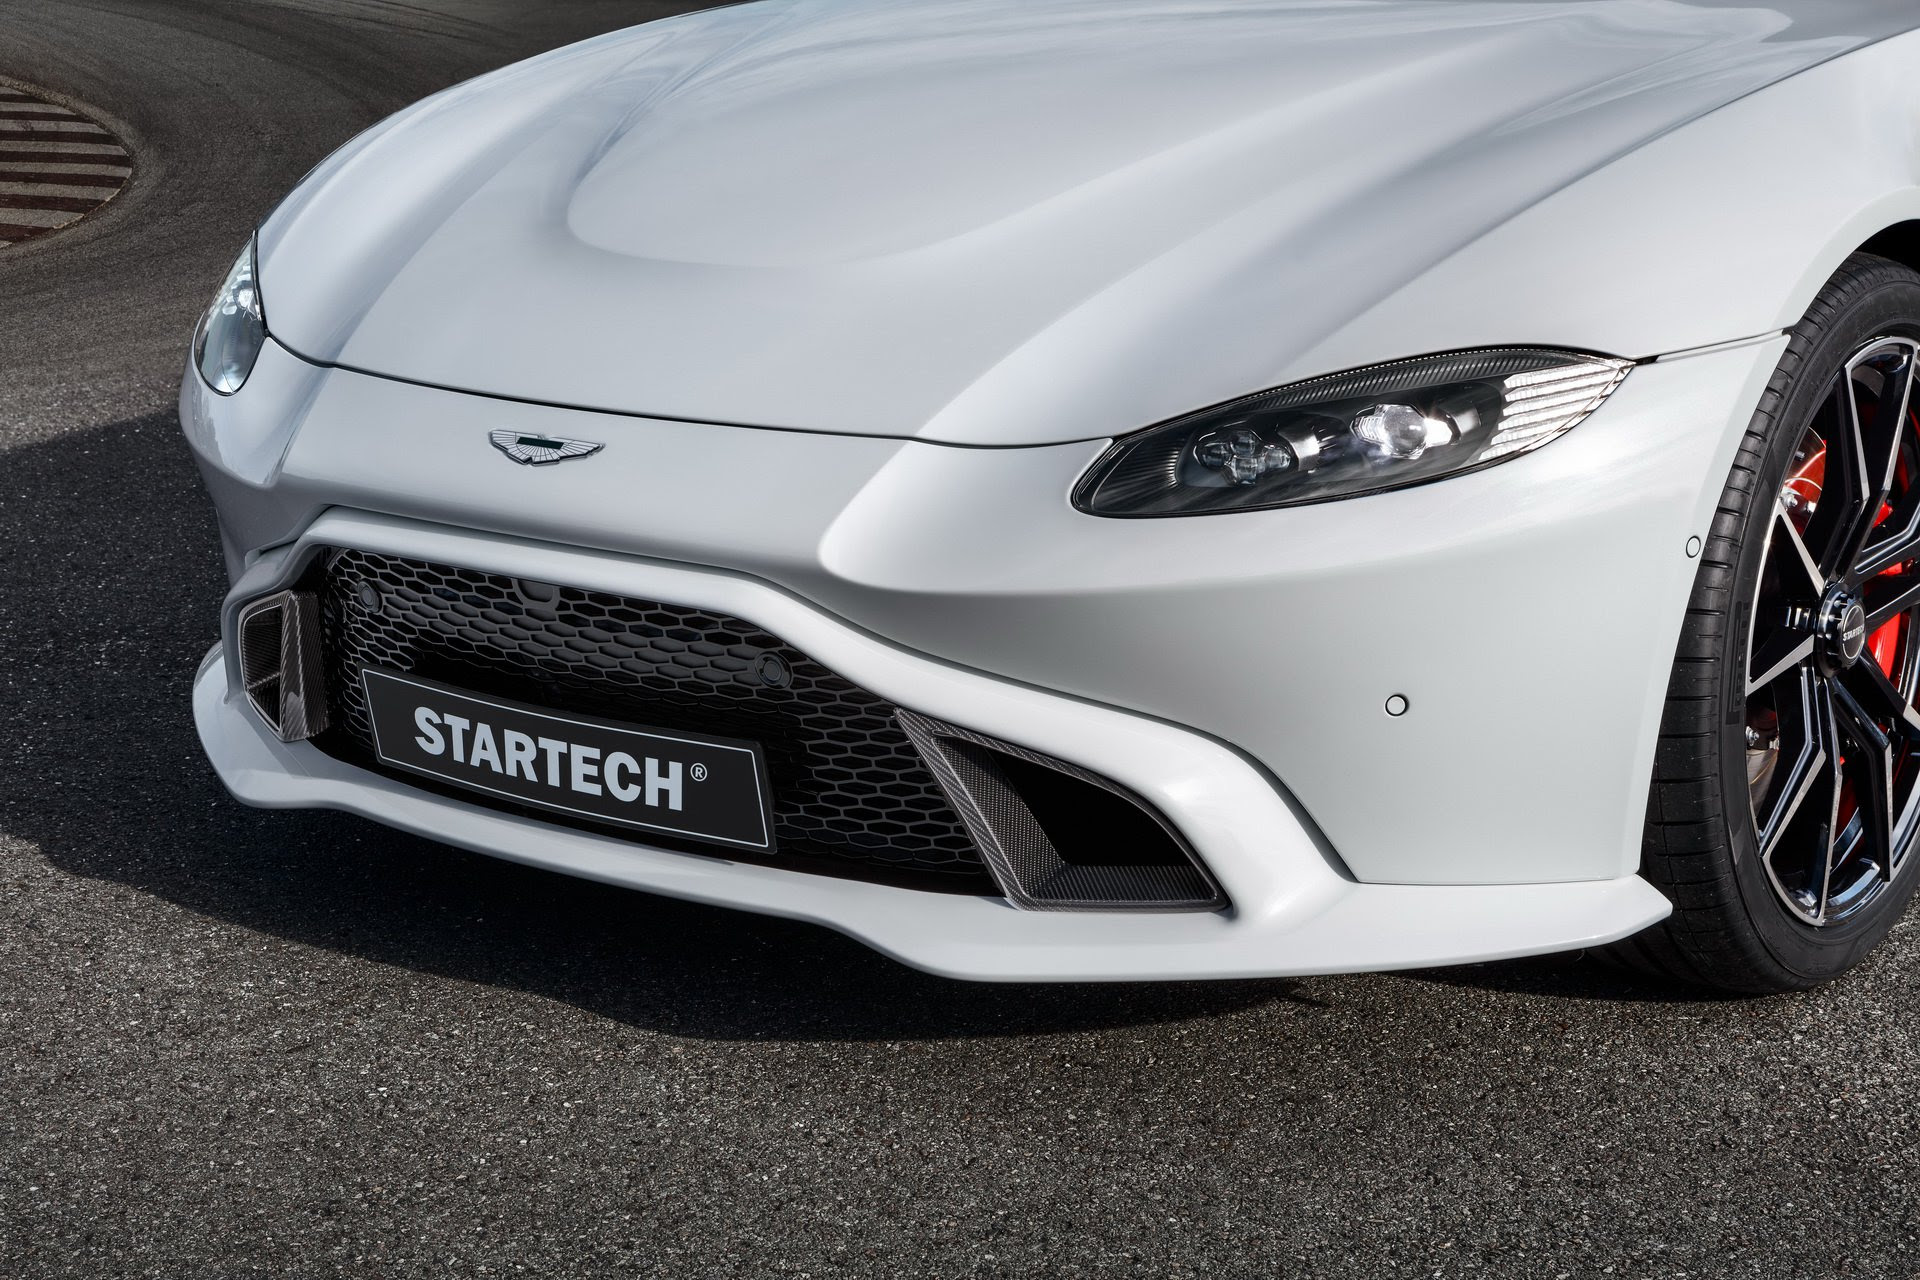 2019 Startech Aston Martin Vantage Headlight Wallpapers 6 Newcarcars